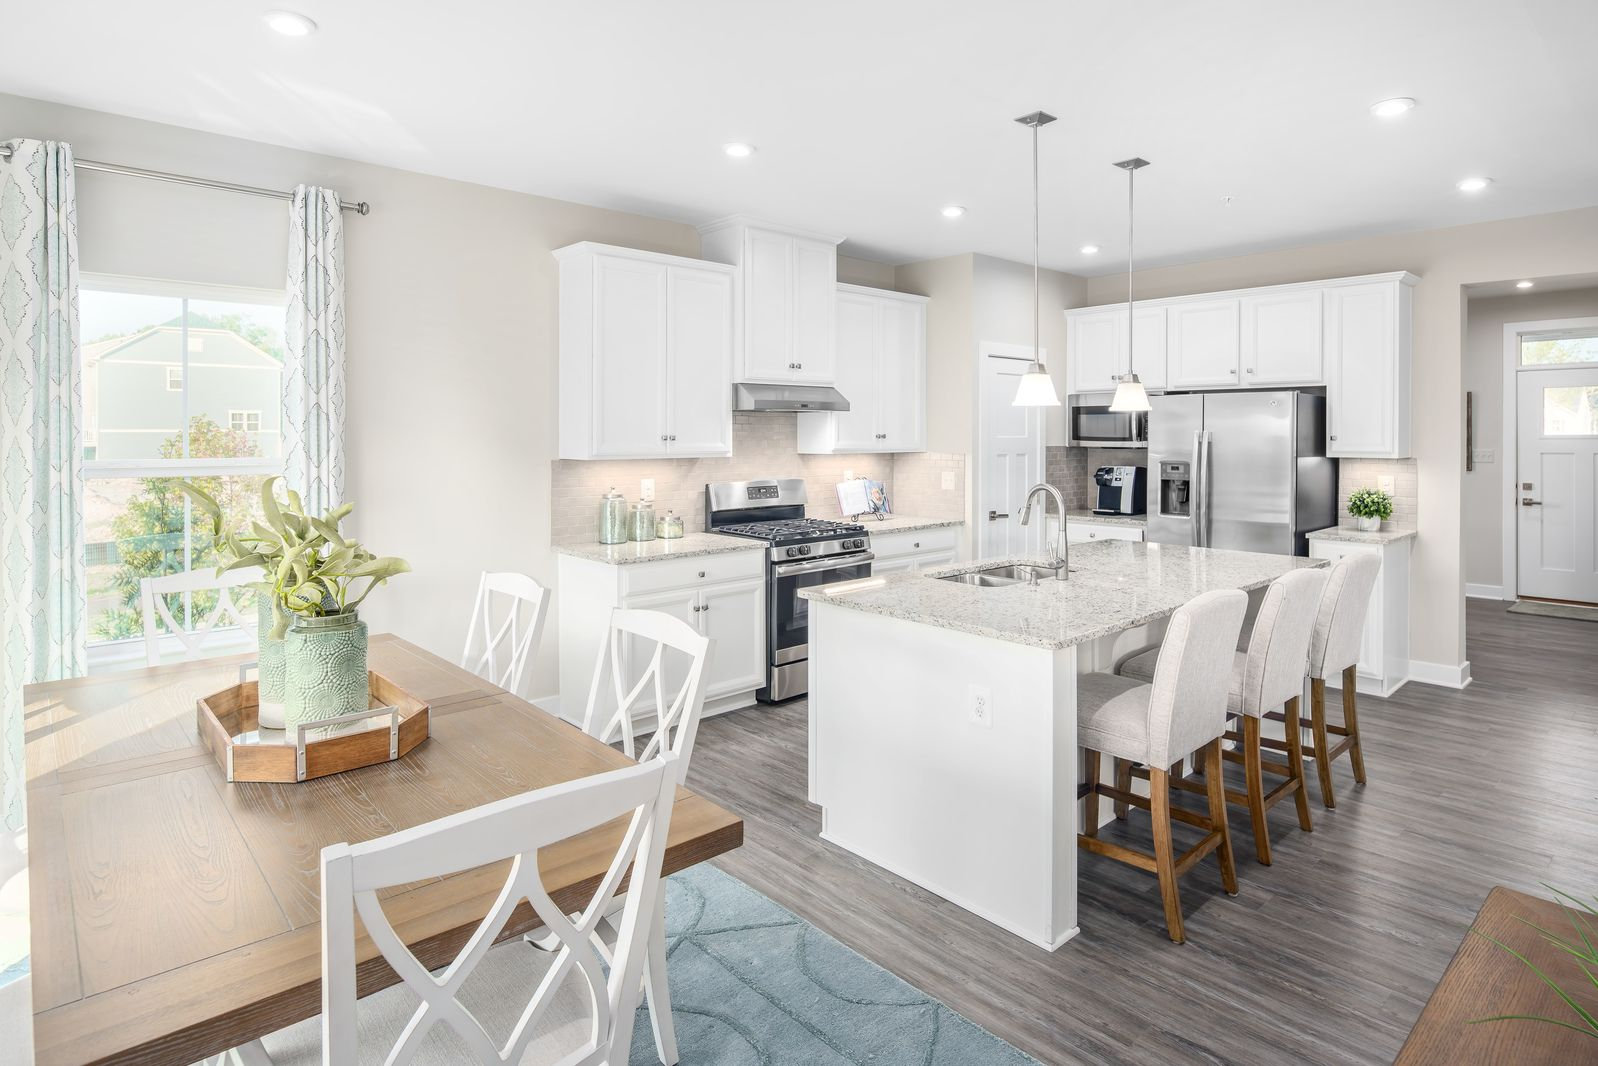 Kitchen featured in the Ballenger By Ryan Homes in Greenville-Spartanburg, SC